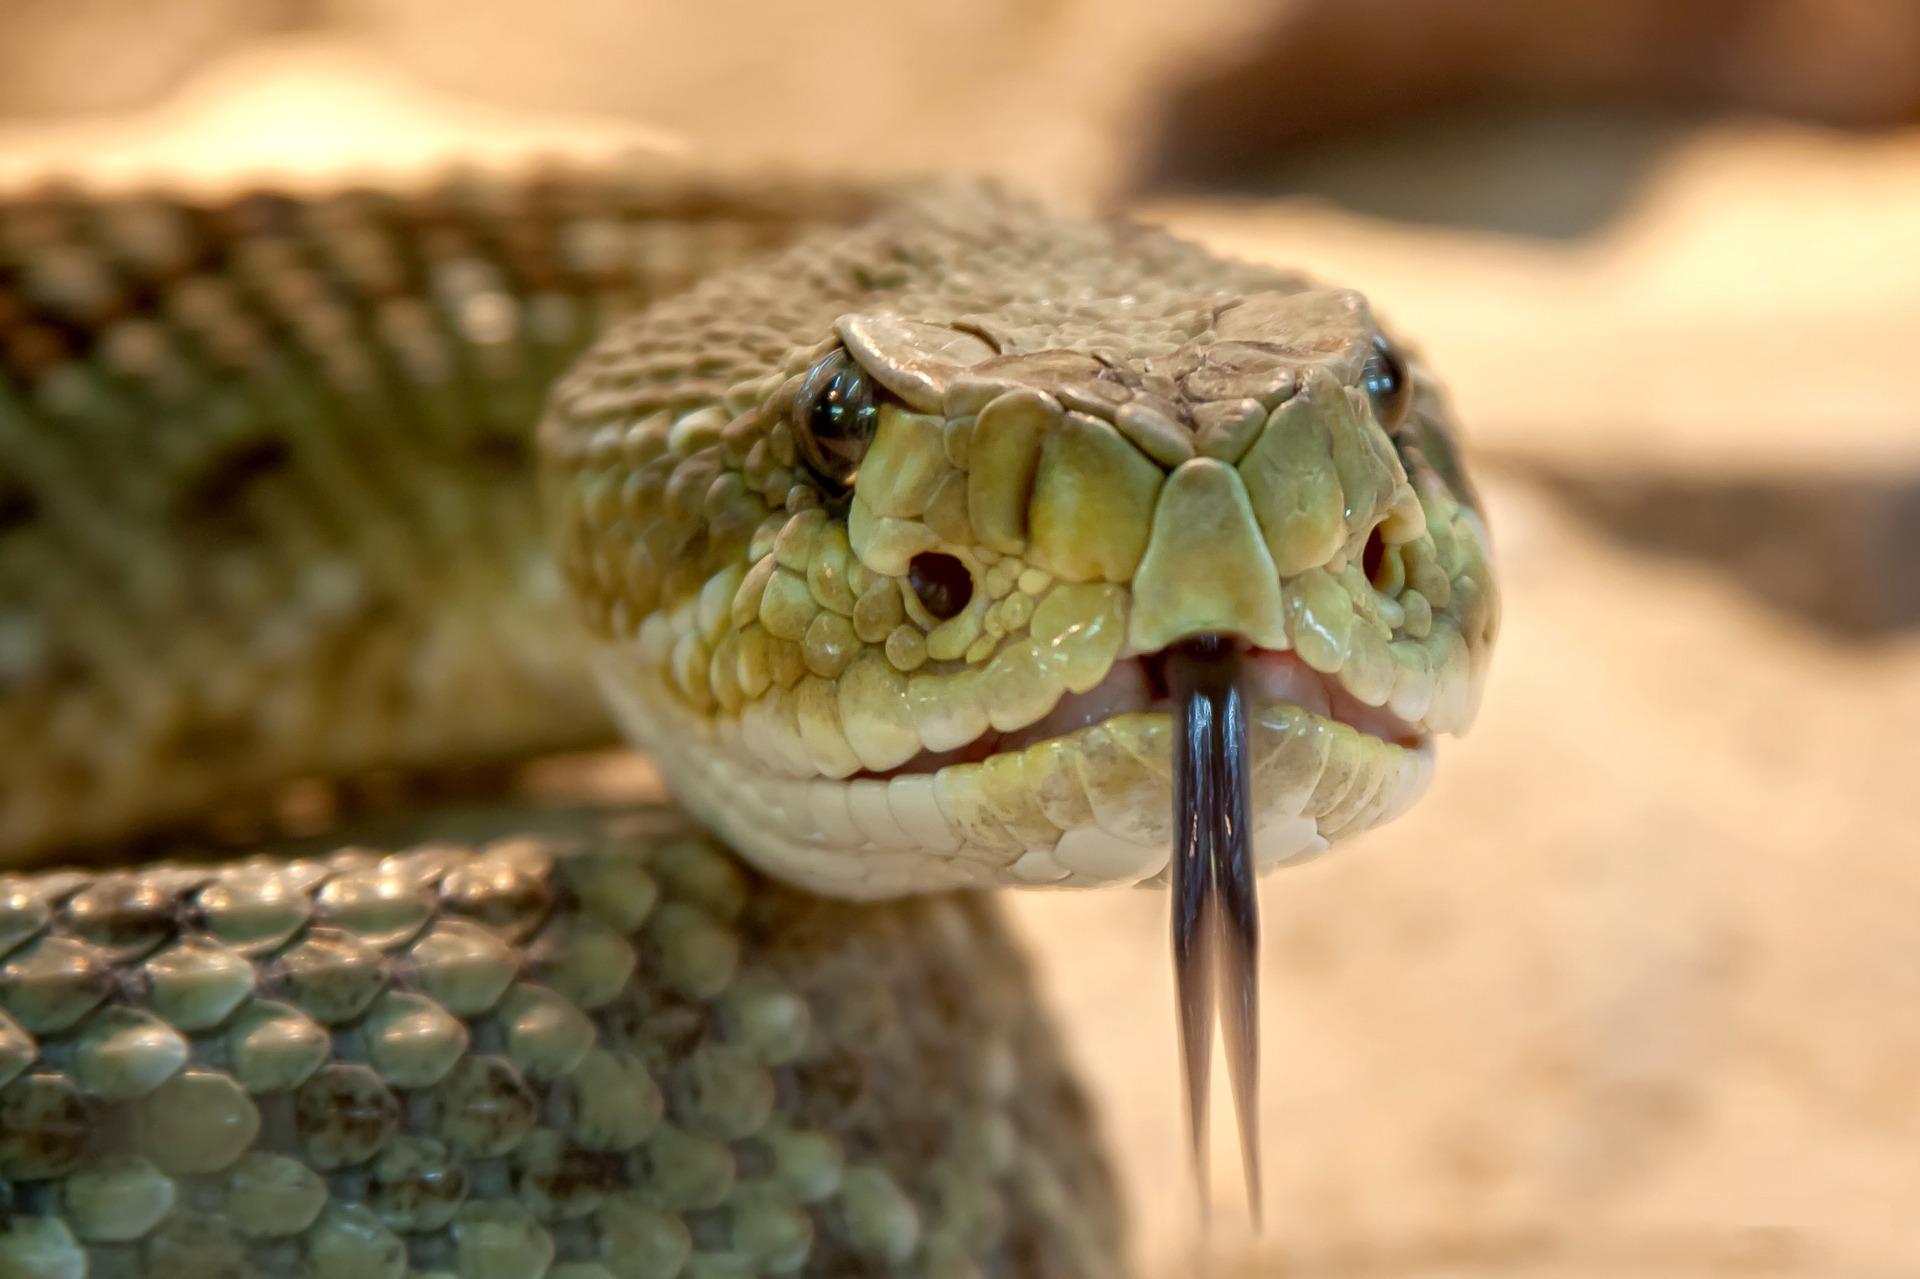 serpientes-ofidios-reptiles-curiosidades-blog-audicion-anatomia-timpano-vibraciones